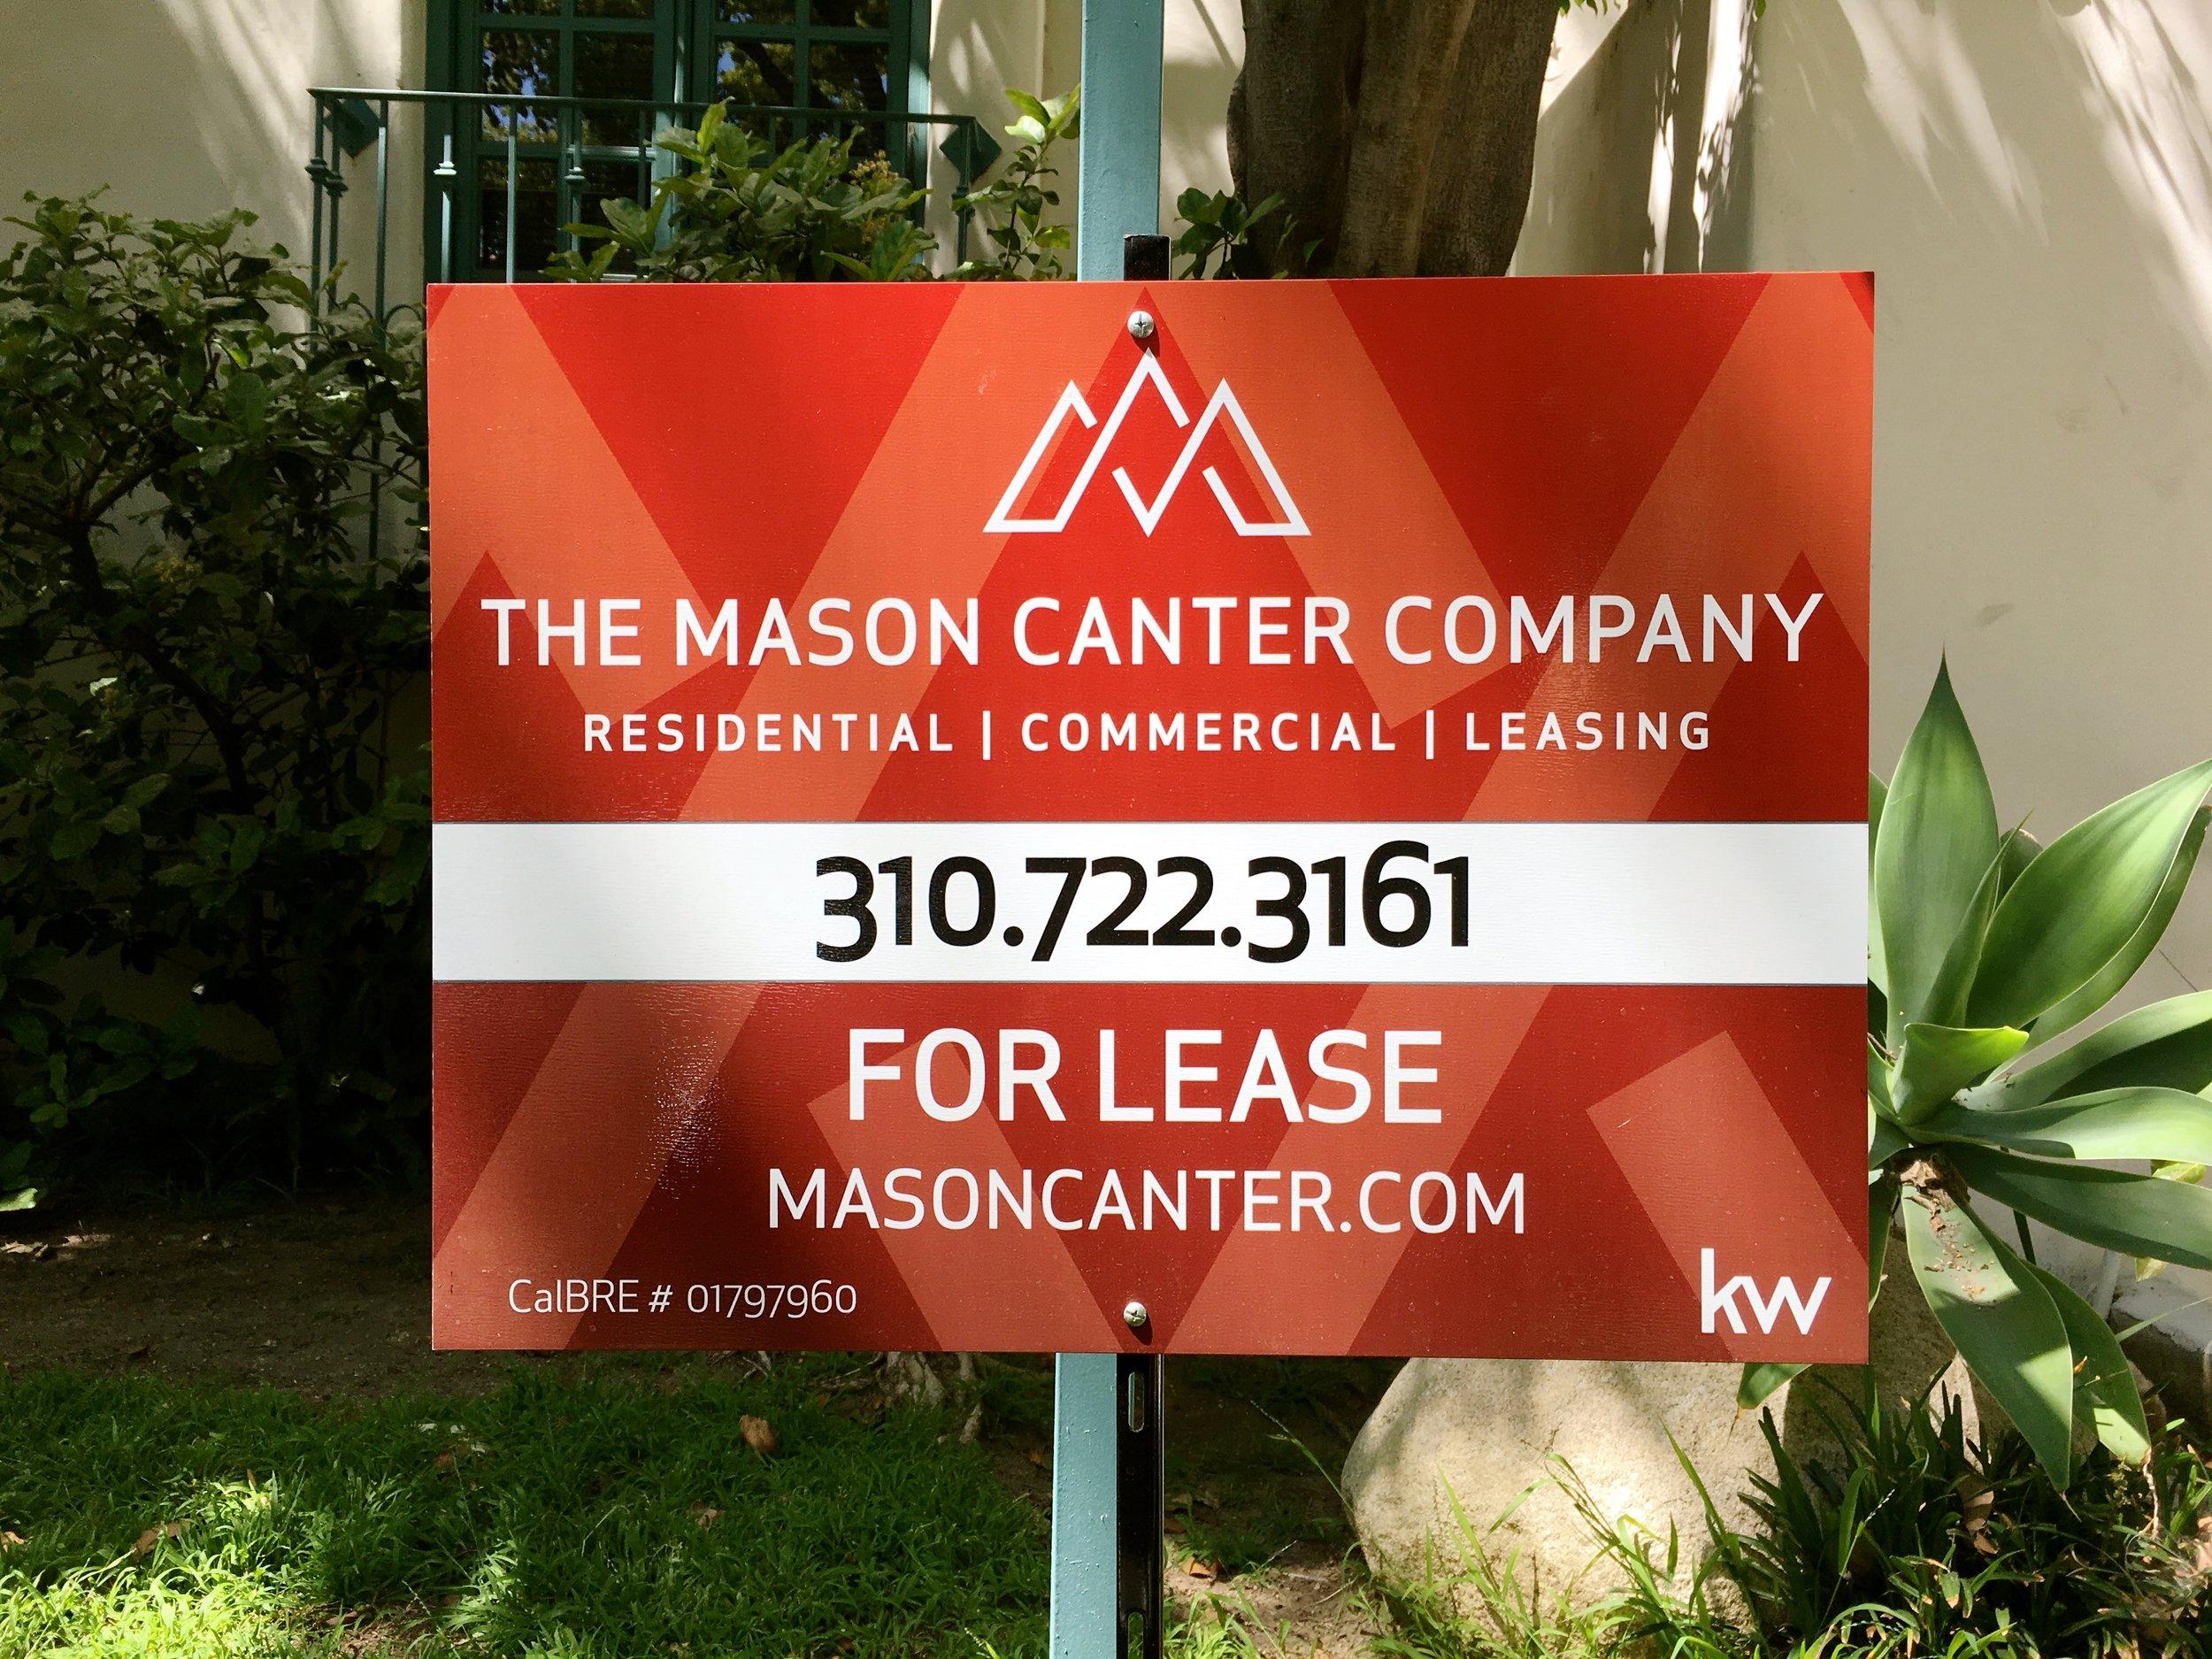 MasonCanterRESign.jpg